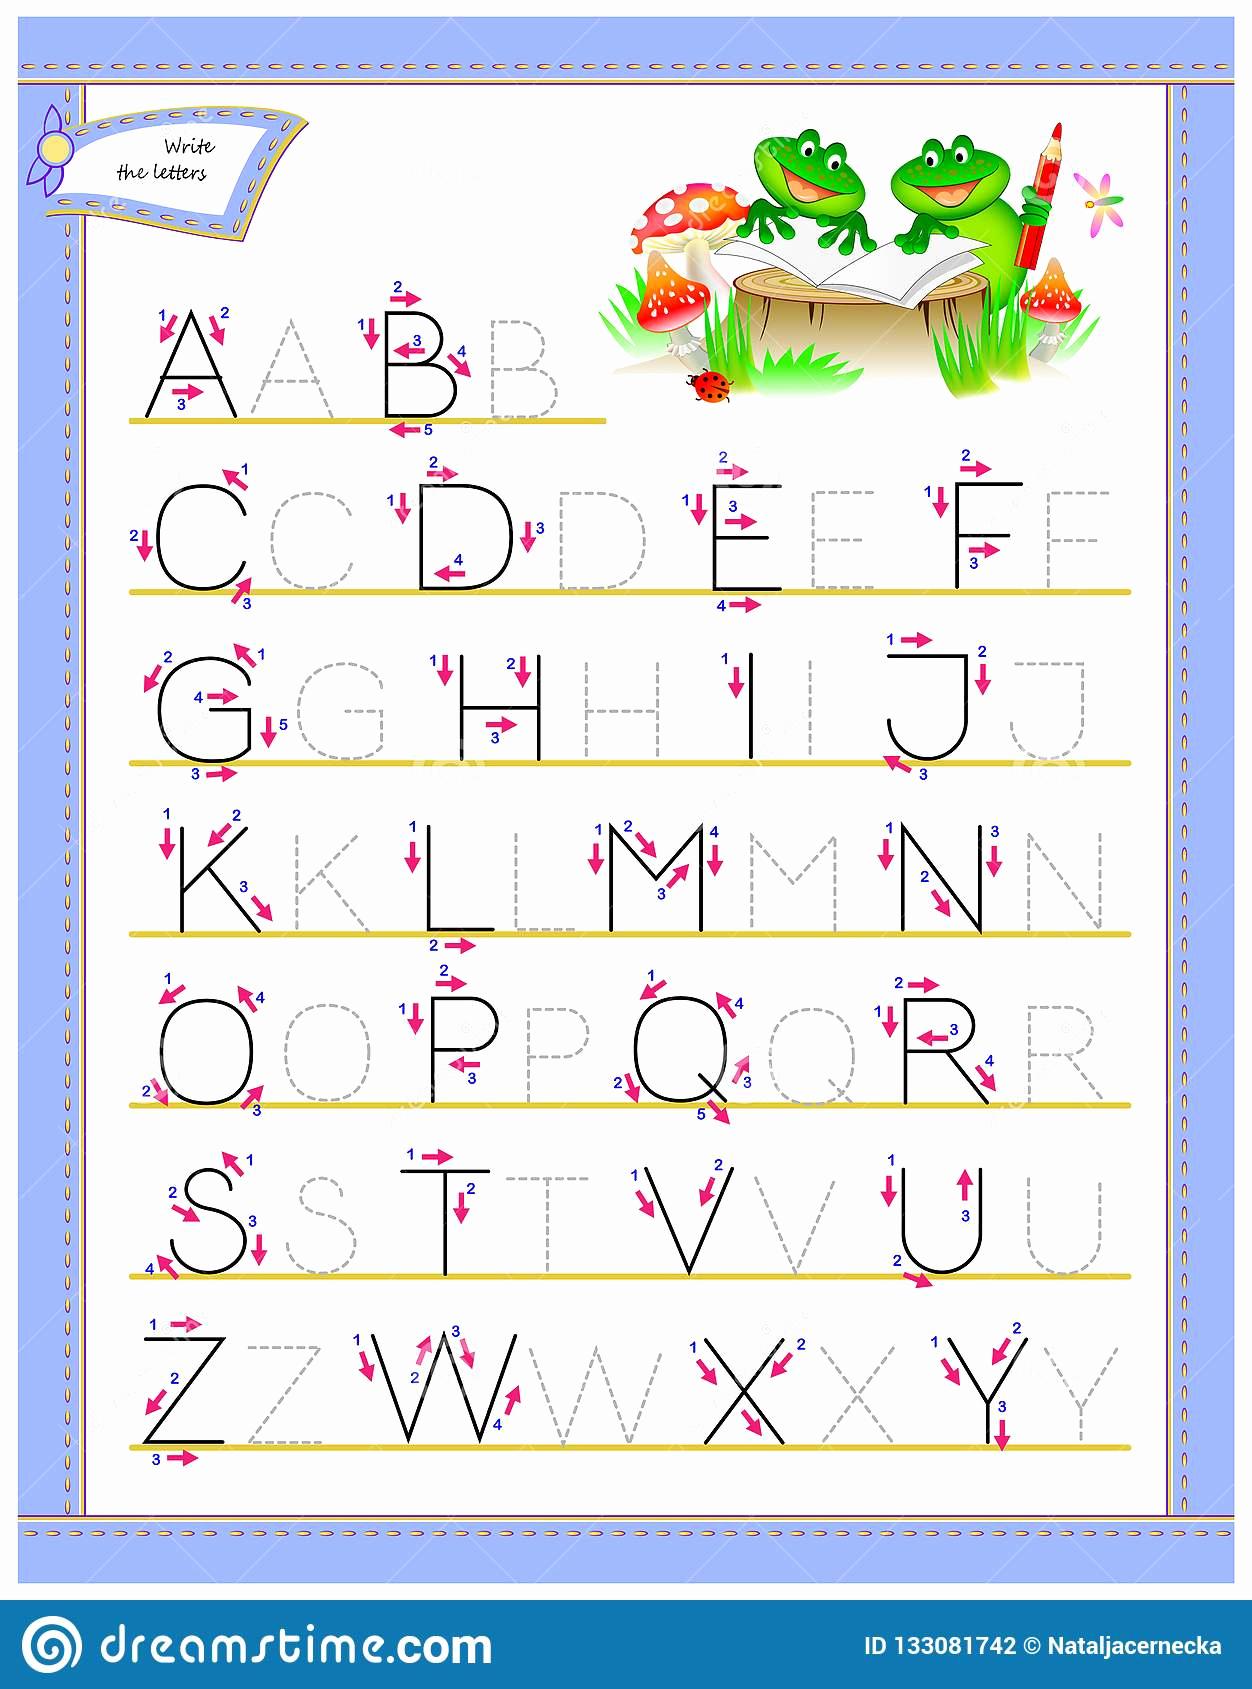 Alphabet Trace Worksheet Elegant Abcd Tracing Worksheet